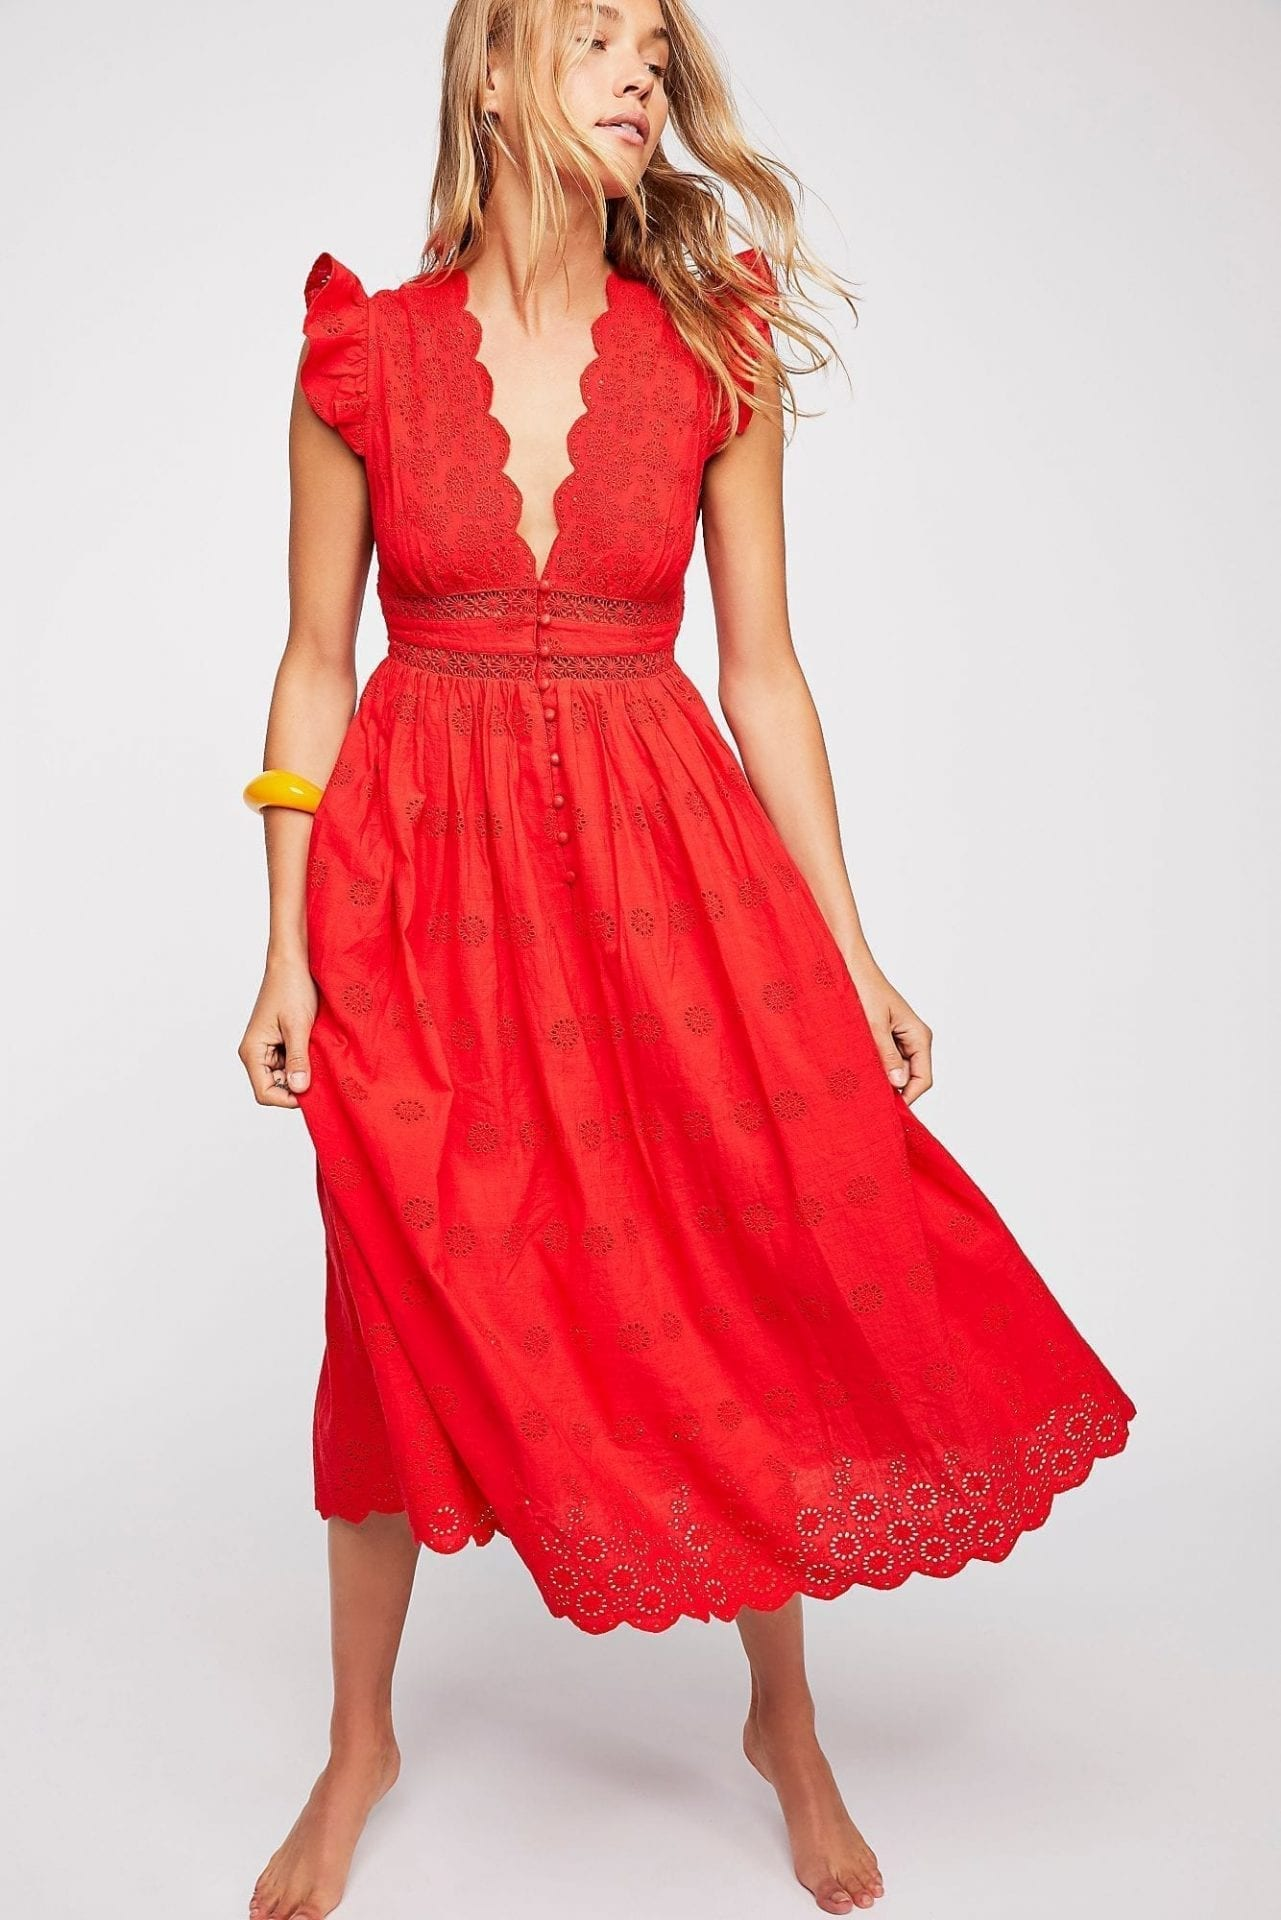 FREEPEOPLE Peach Pie Midi Bright Red Dress